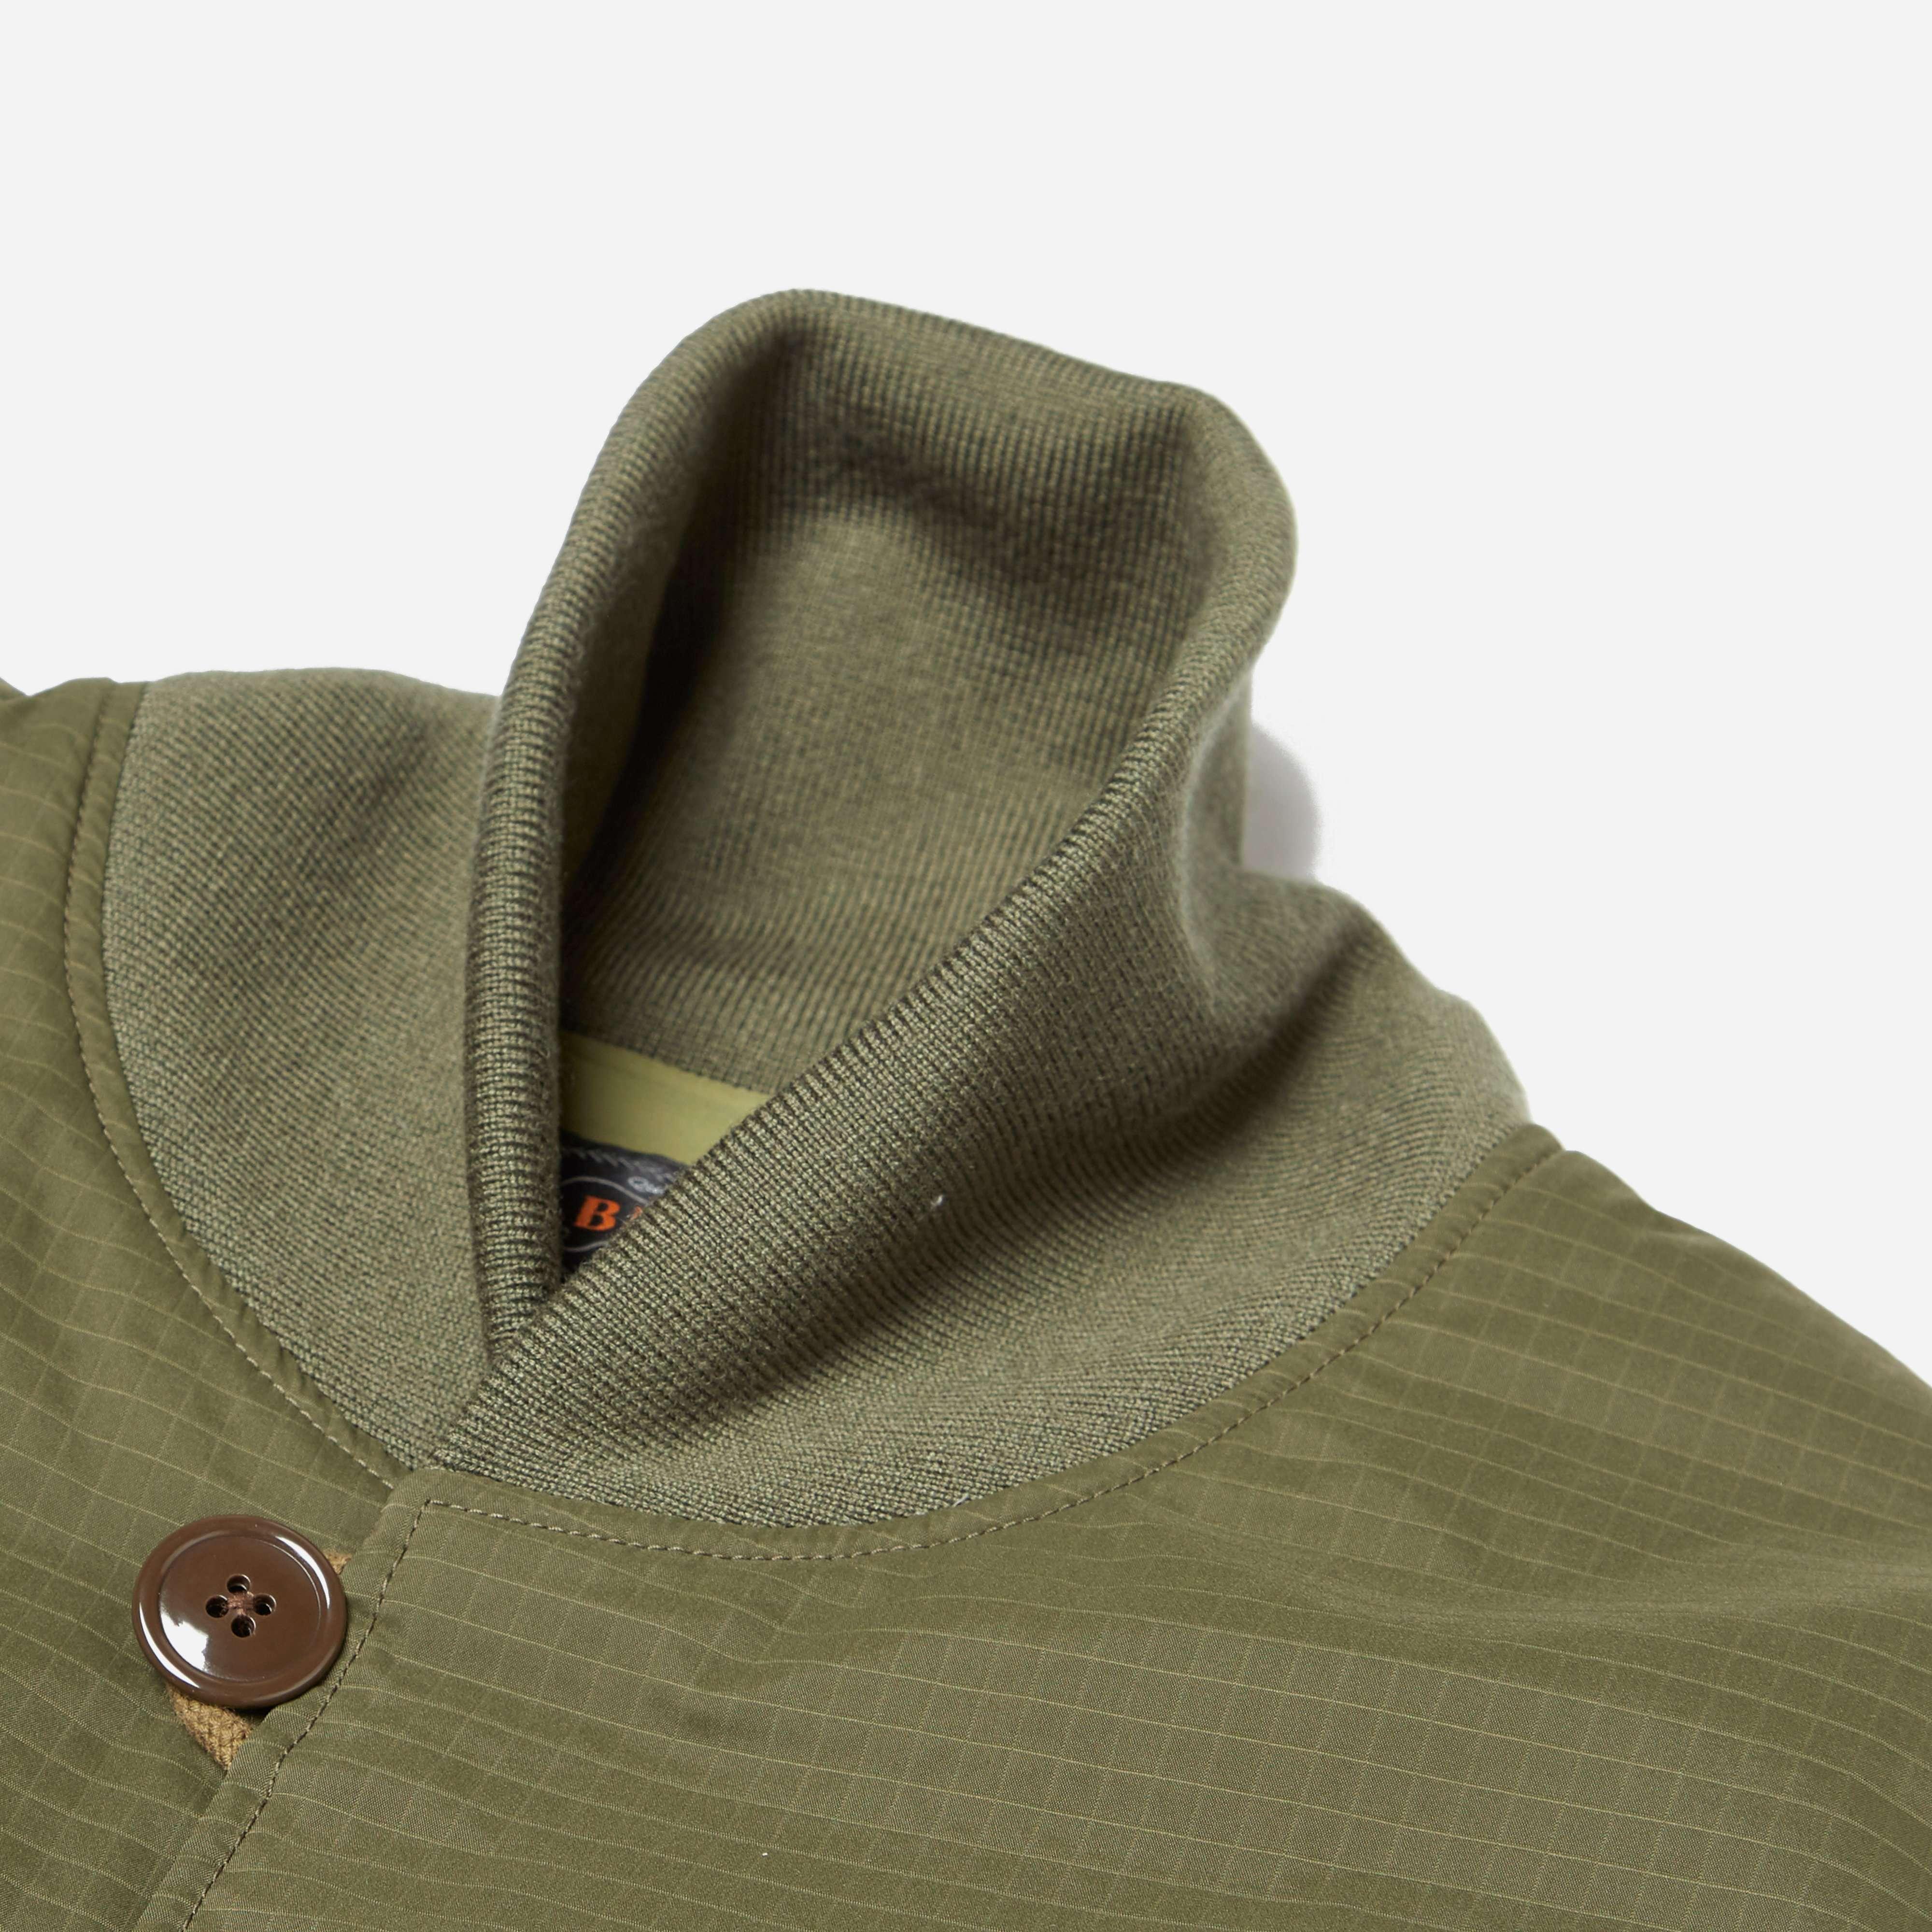 Beams Plus M43 Ripstop Jacket